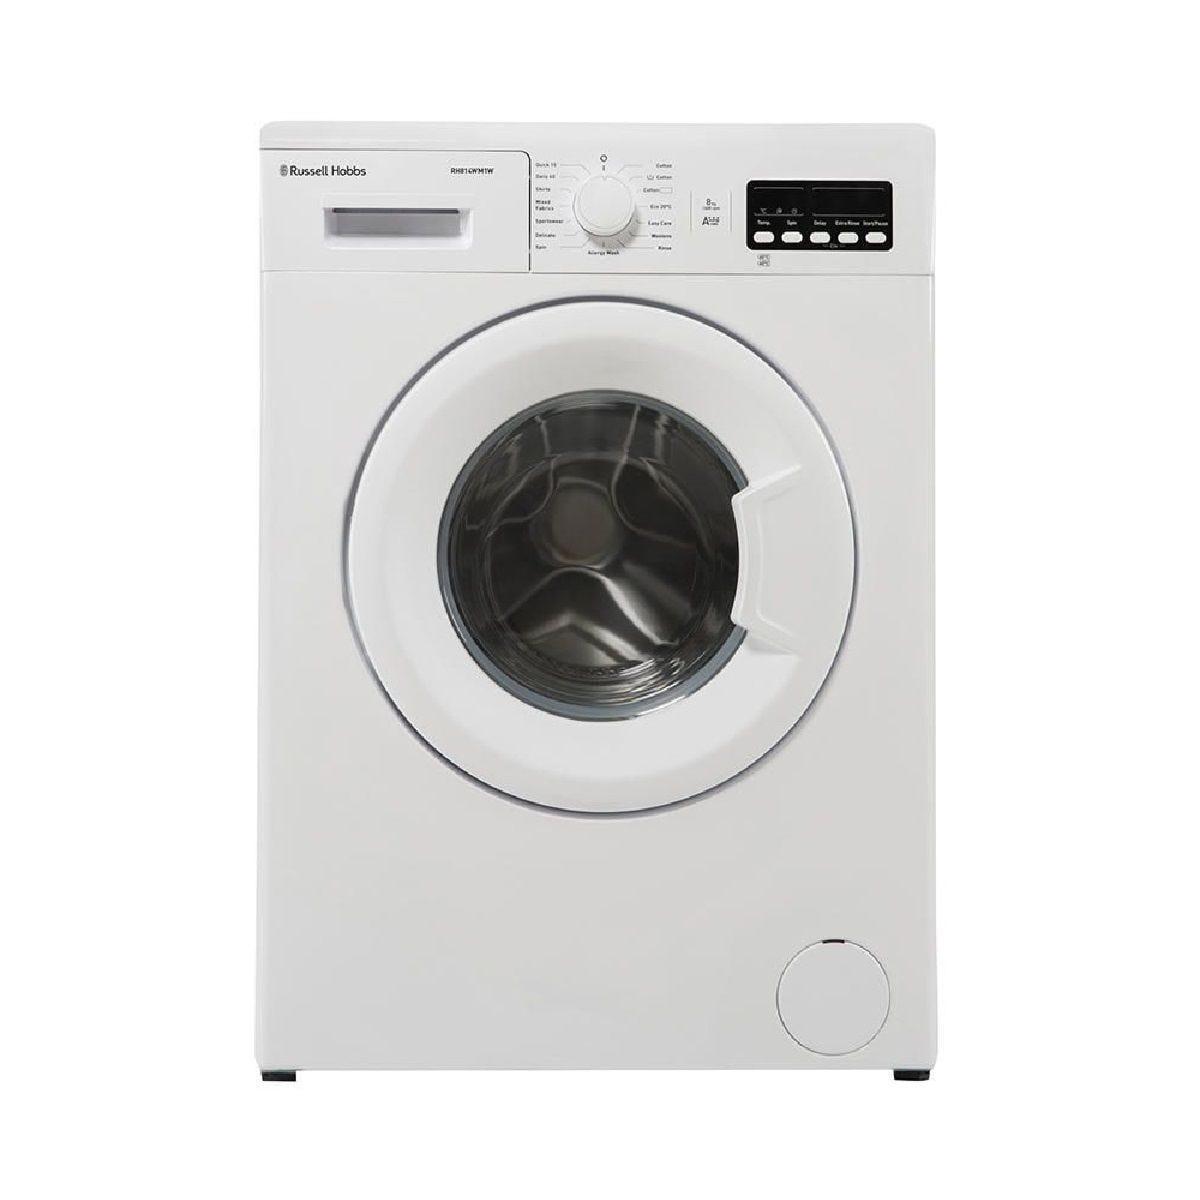 Russell Hobbs RH814WM1W Freestanding 8Kg 1400rpm Washing Machine - White